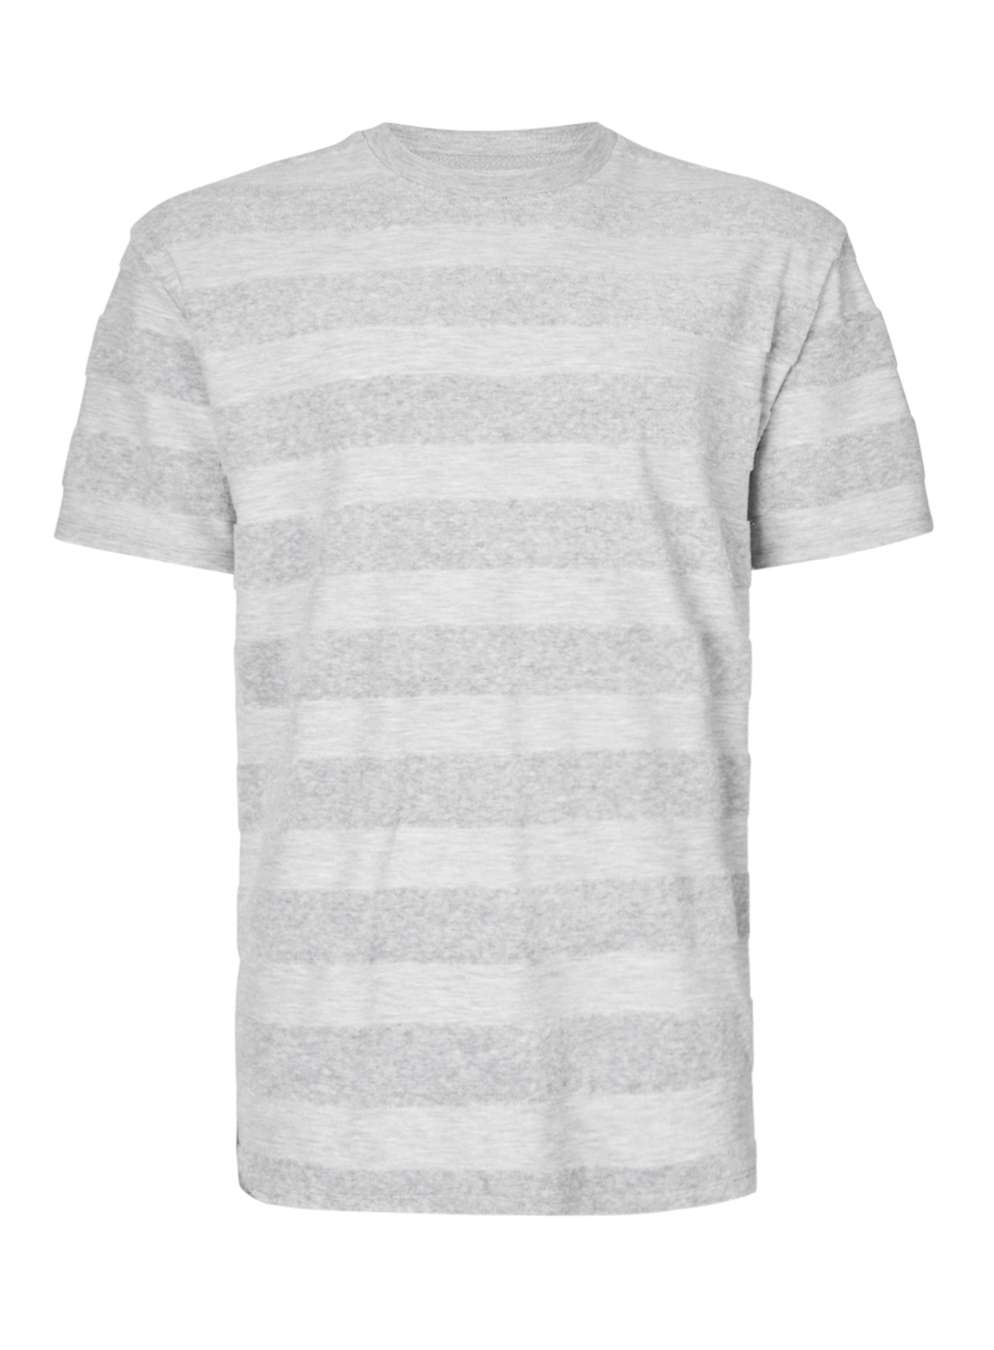 TOPMAN LTD Grey Stripe Towelling T-Shirt , £25